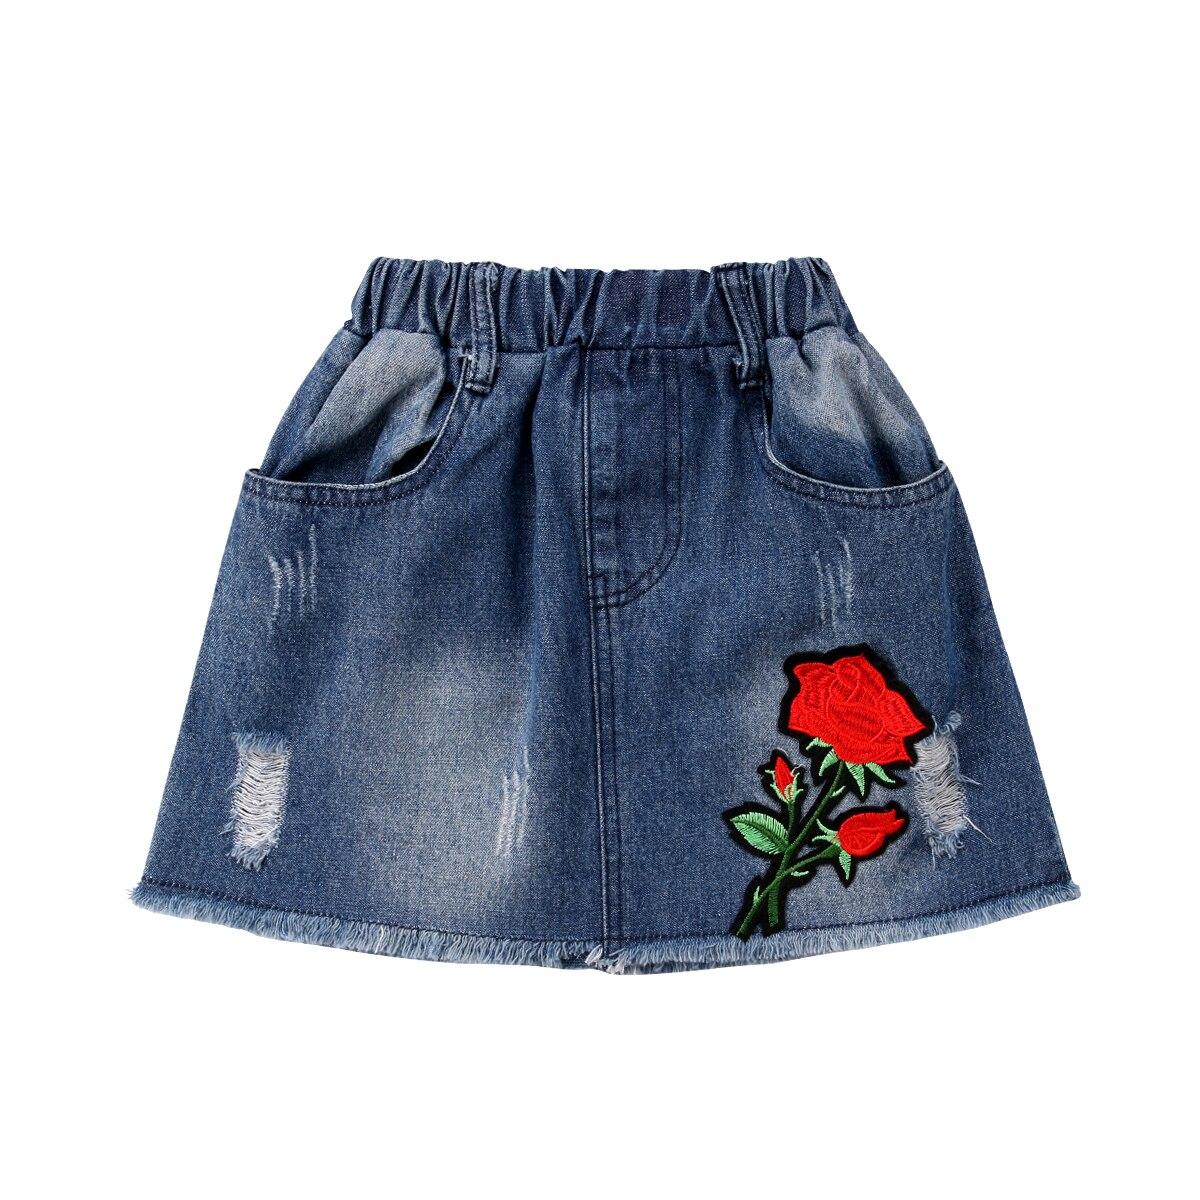 db302da9114c Kids Baby Girl Clothing Skirts Denim Ripped Short Summer Casual Elastic  Waist Jeans Summer Skirts Girl